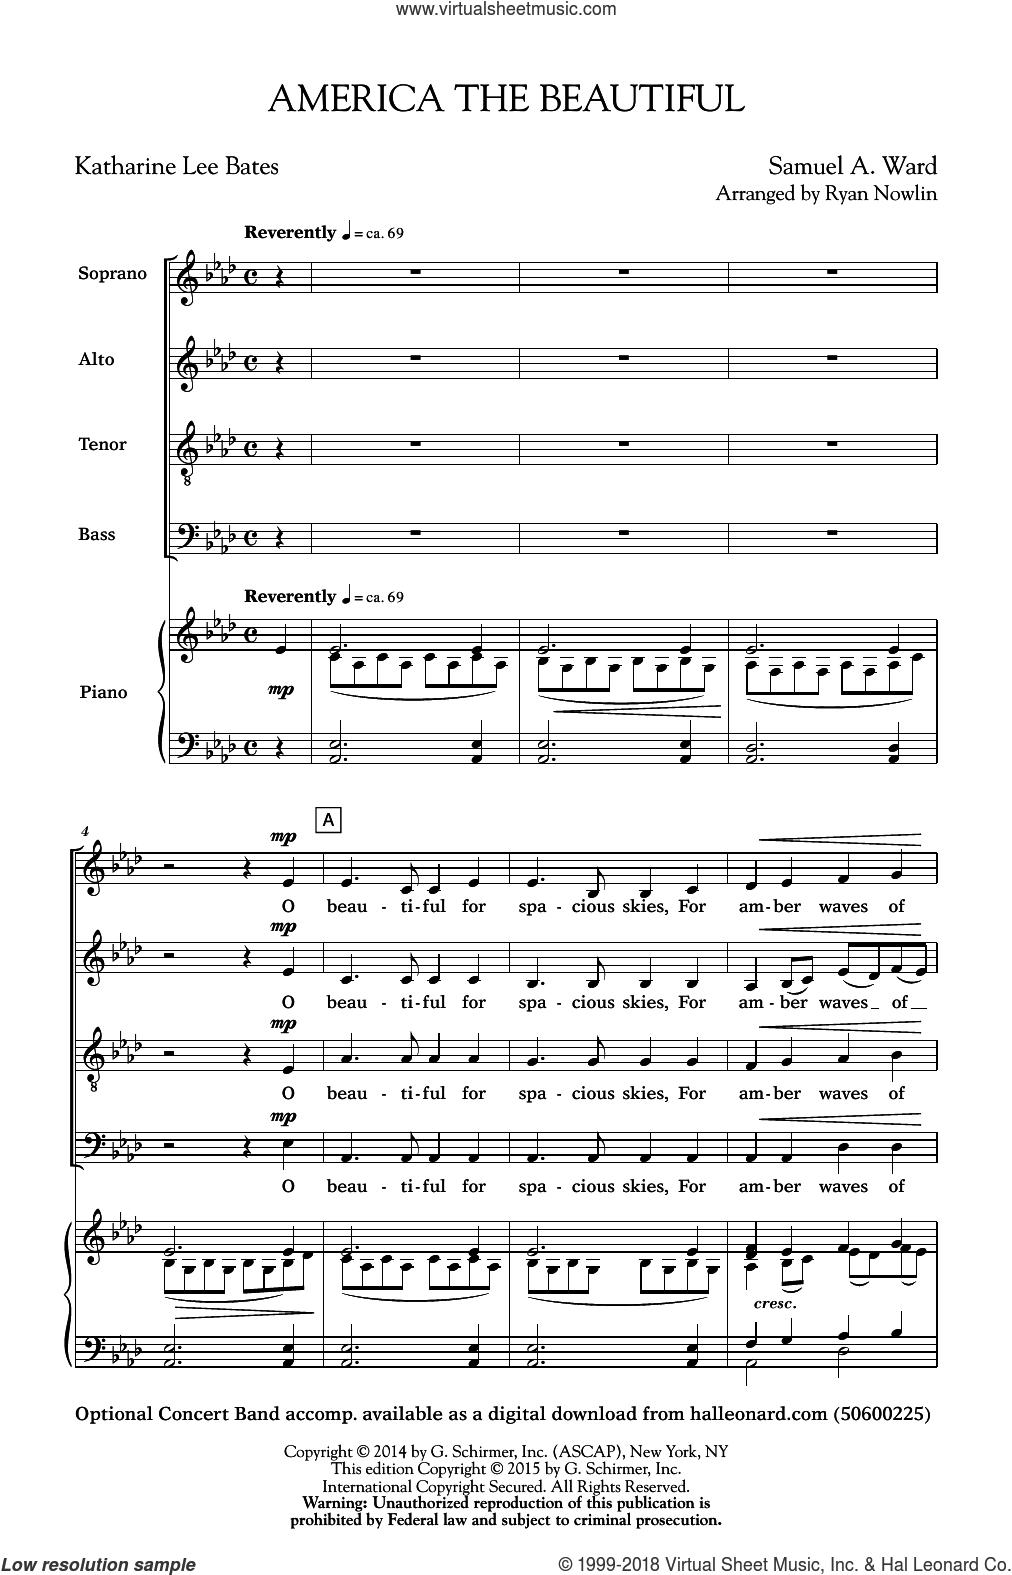 America, The Beautiful sheet music for choir (SATB: soprano, alto, tenor, bass) by Katherine Lee Bates, Ryan Nowlin and Samuel Augustus Ward, intermediate skill level